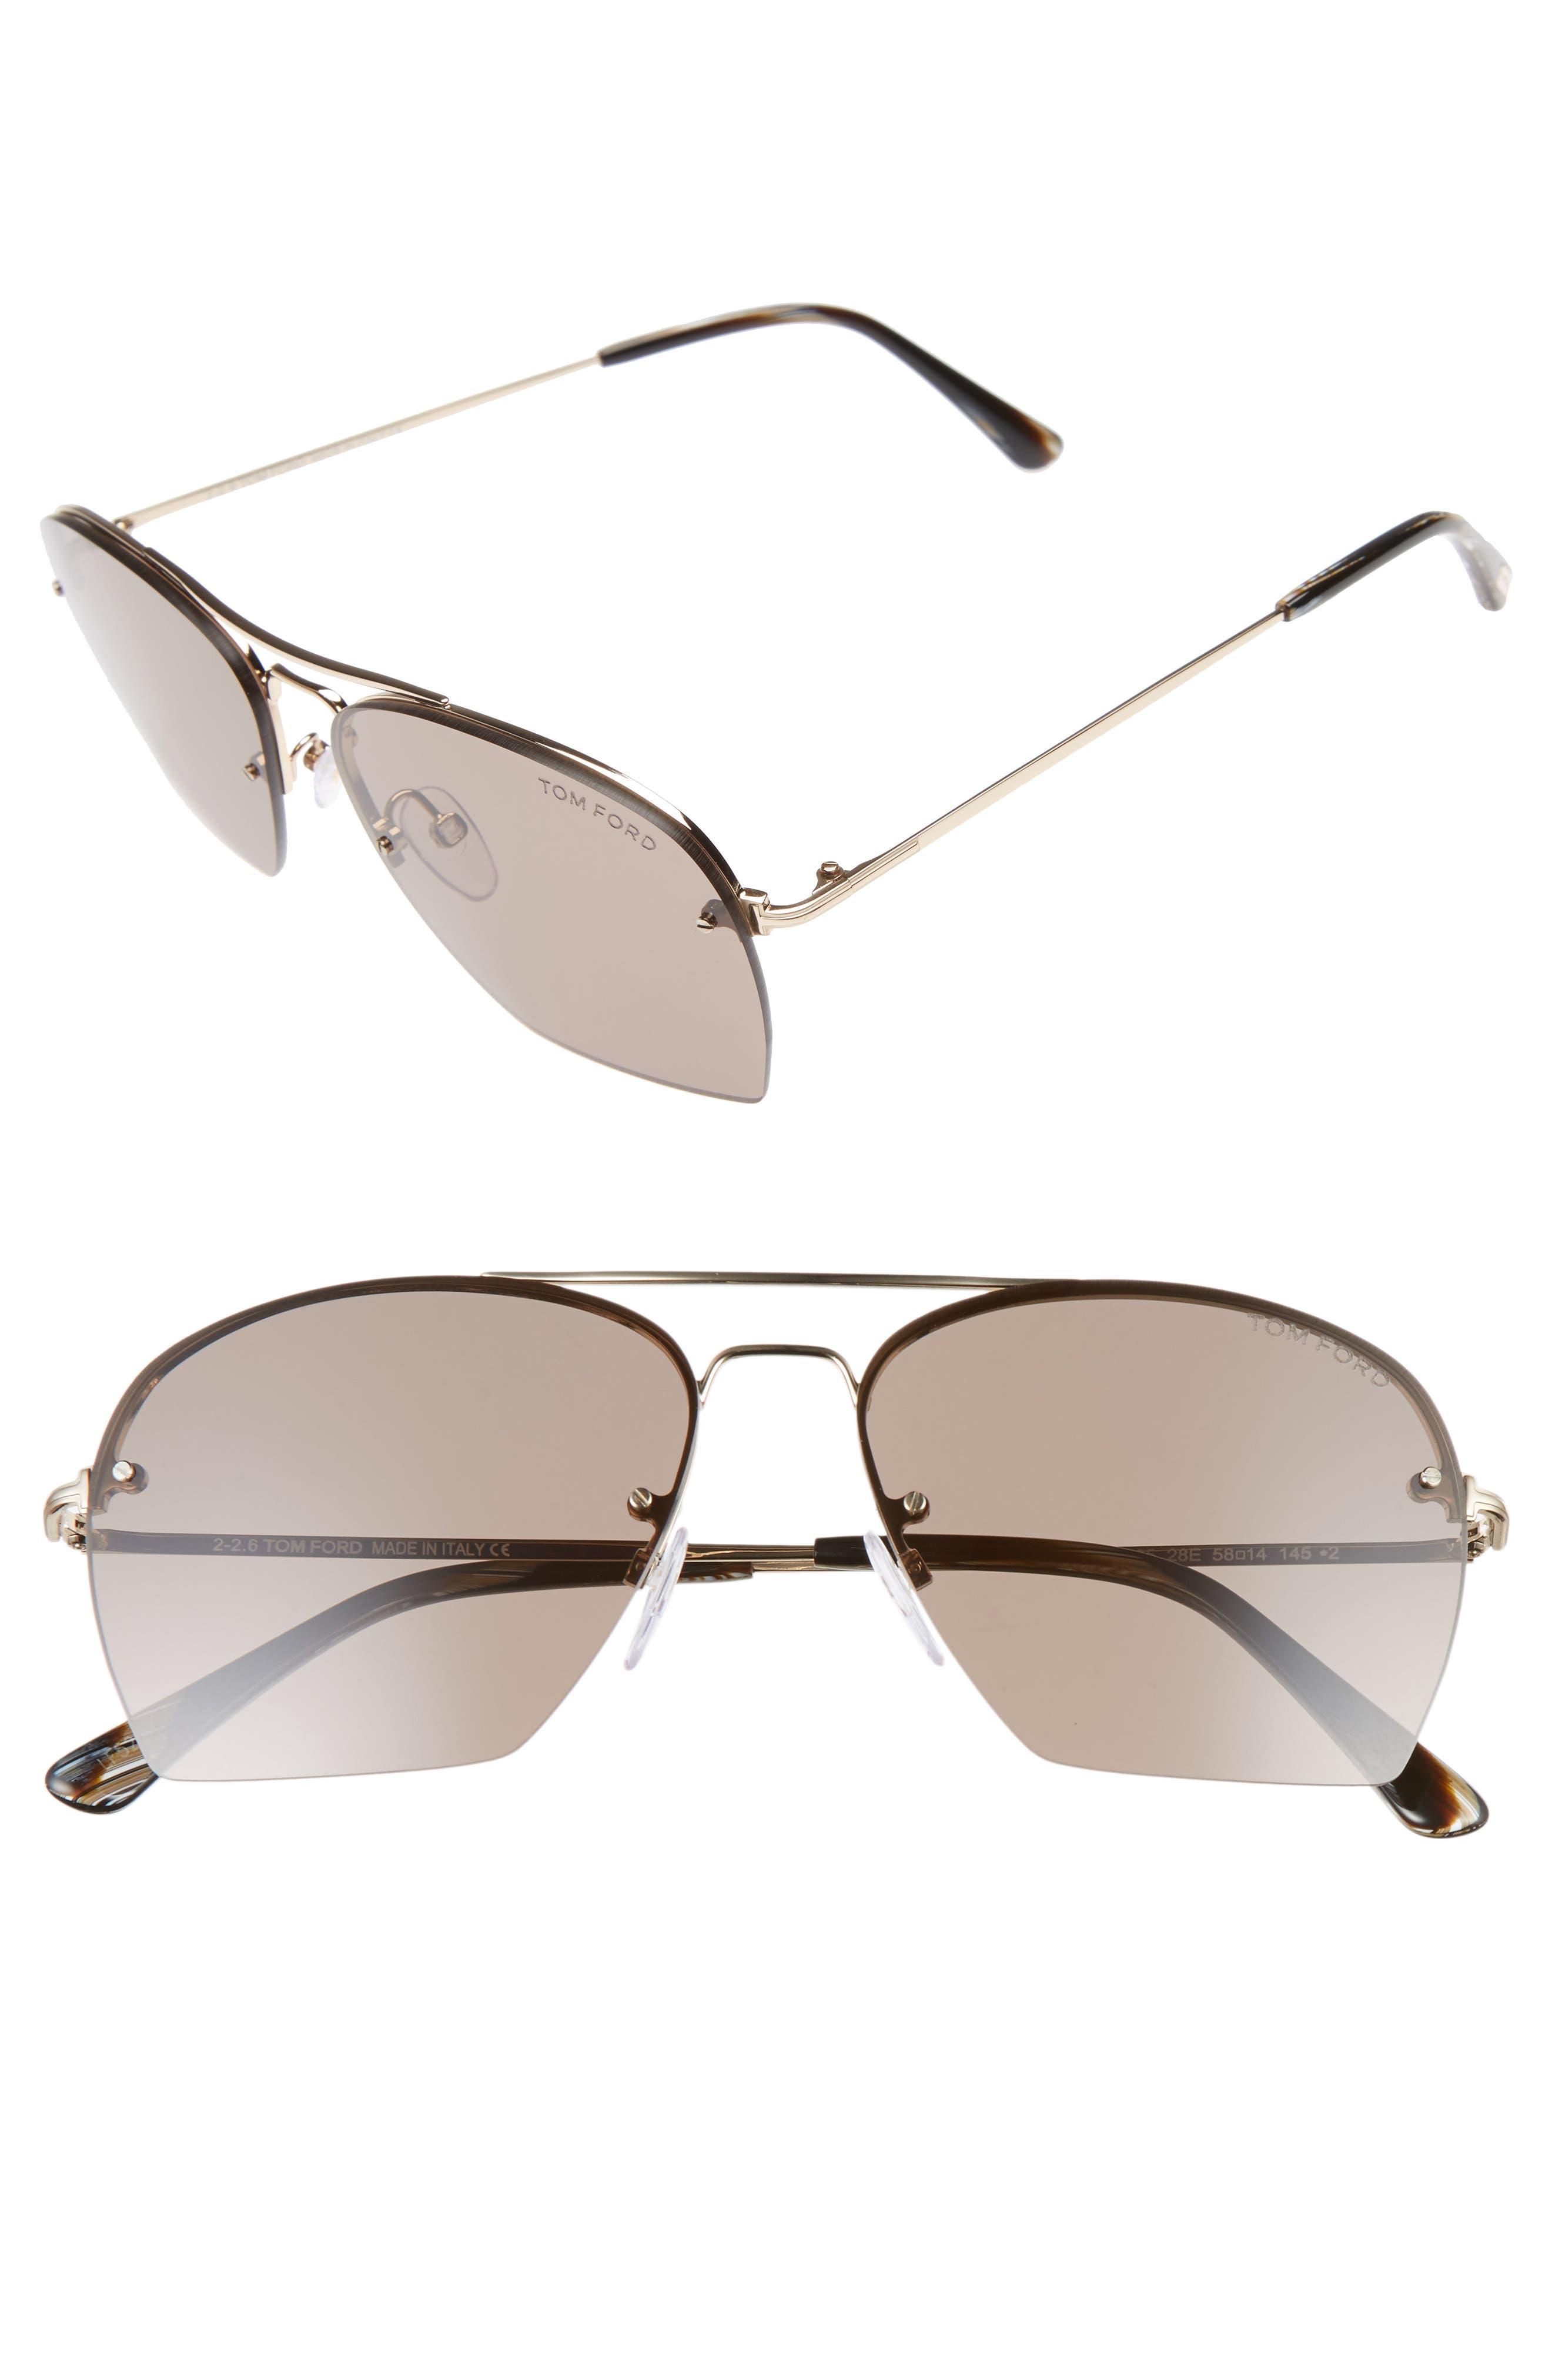 Main Image - Tom Ford Whelan 58mm Aviator Sunglasses